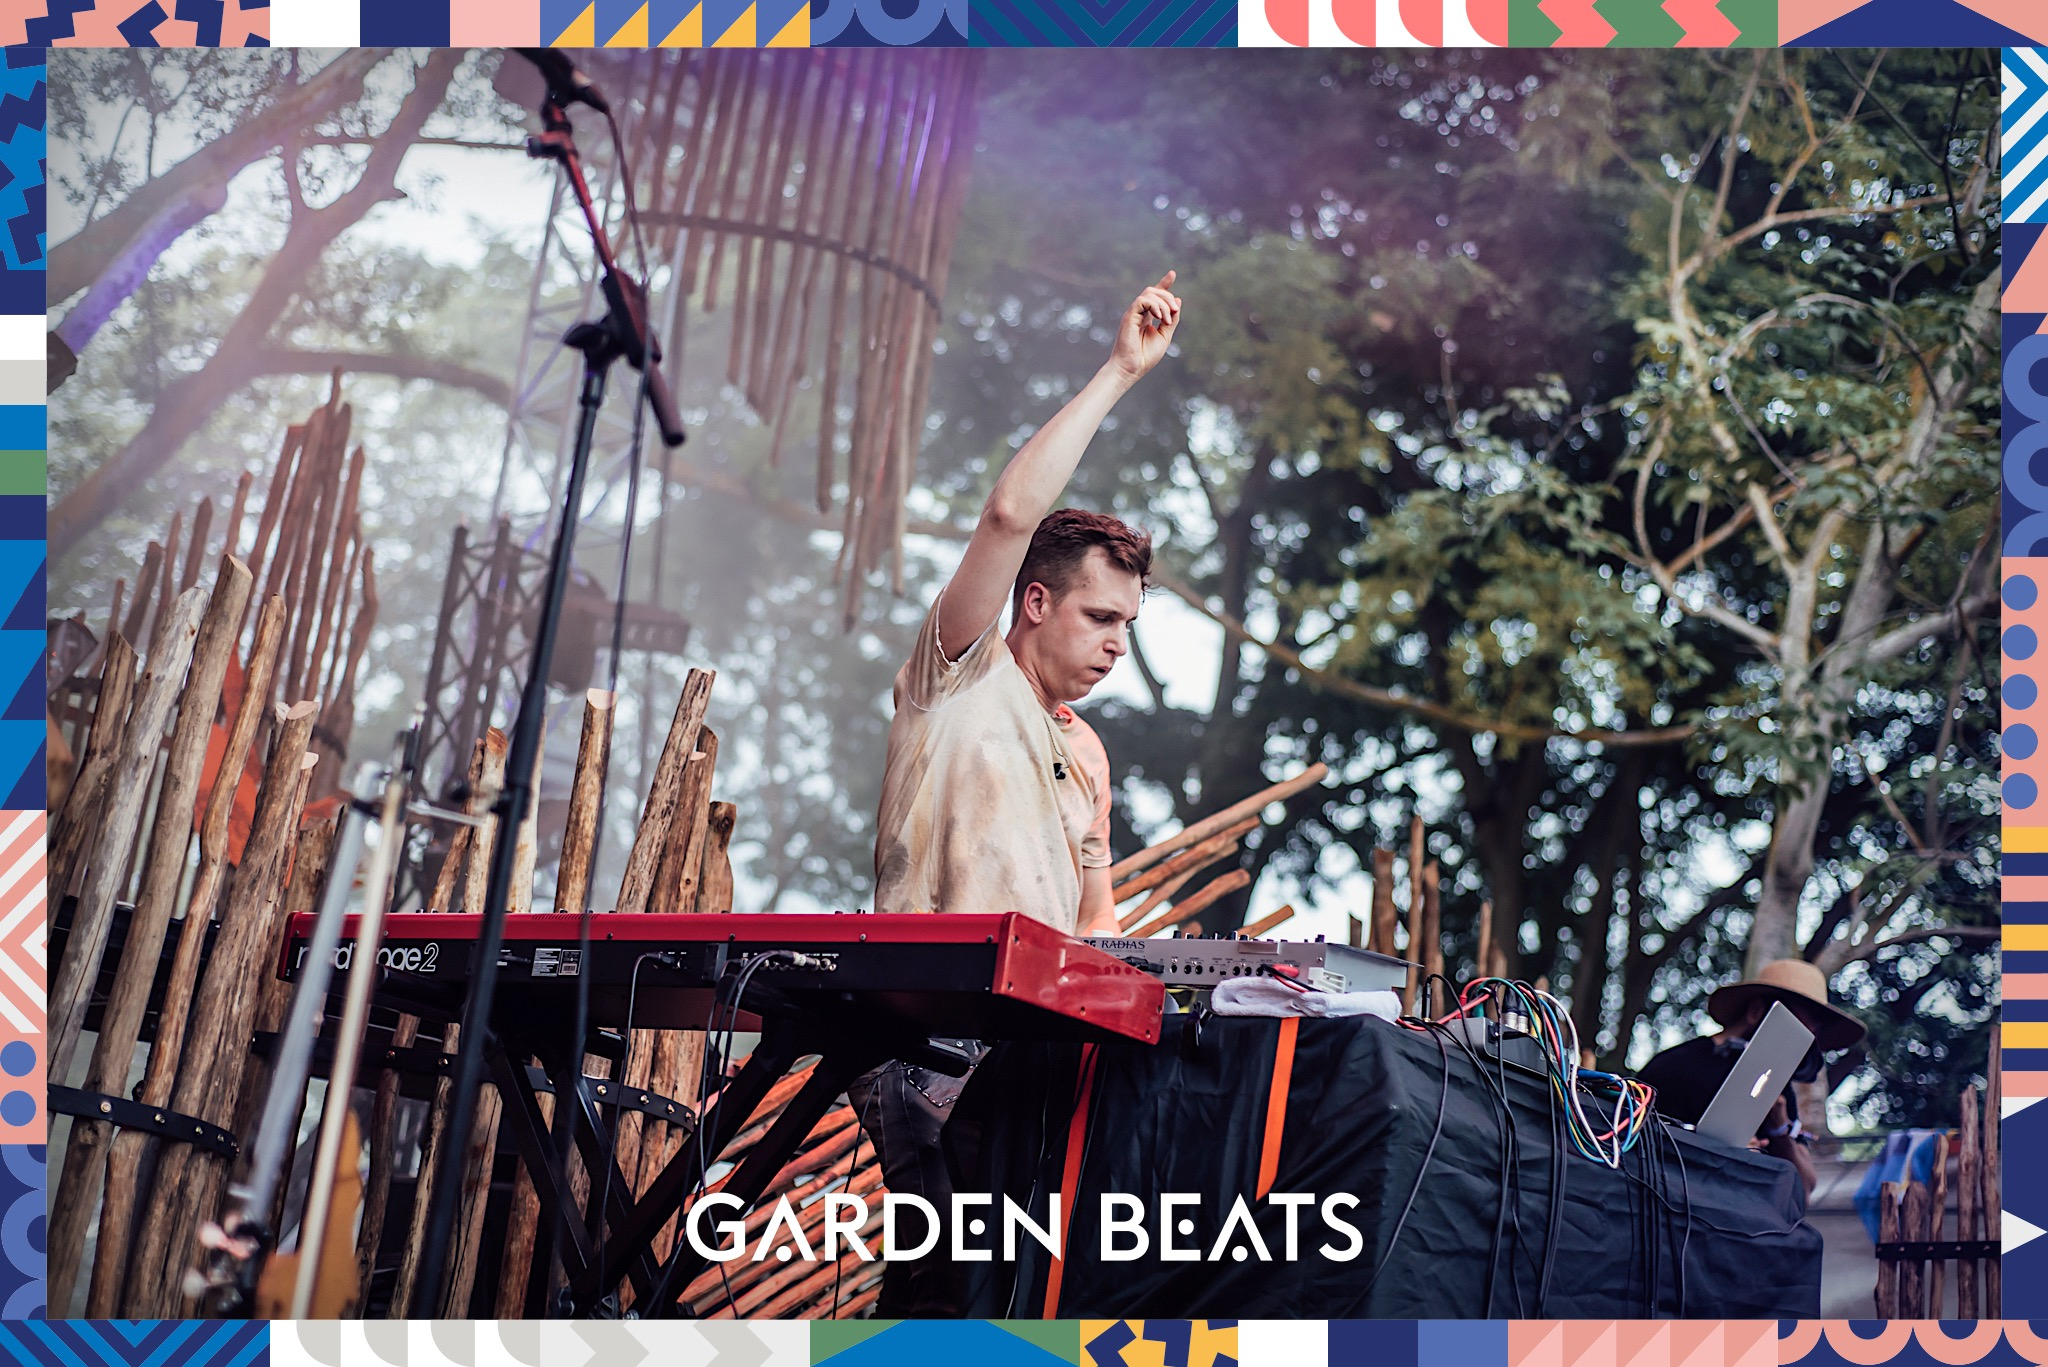 18032017_GardenBeats_Colossal656_WatermarkedGB.jpg